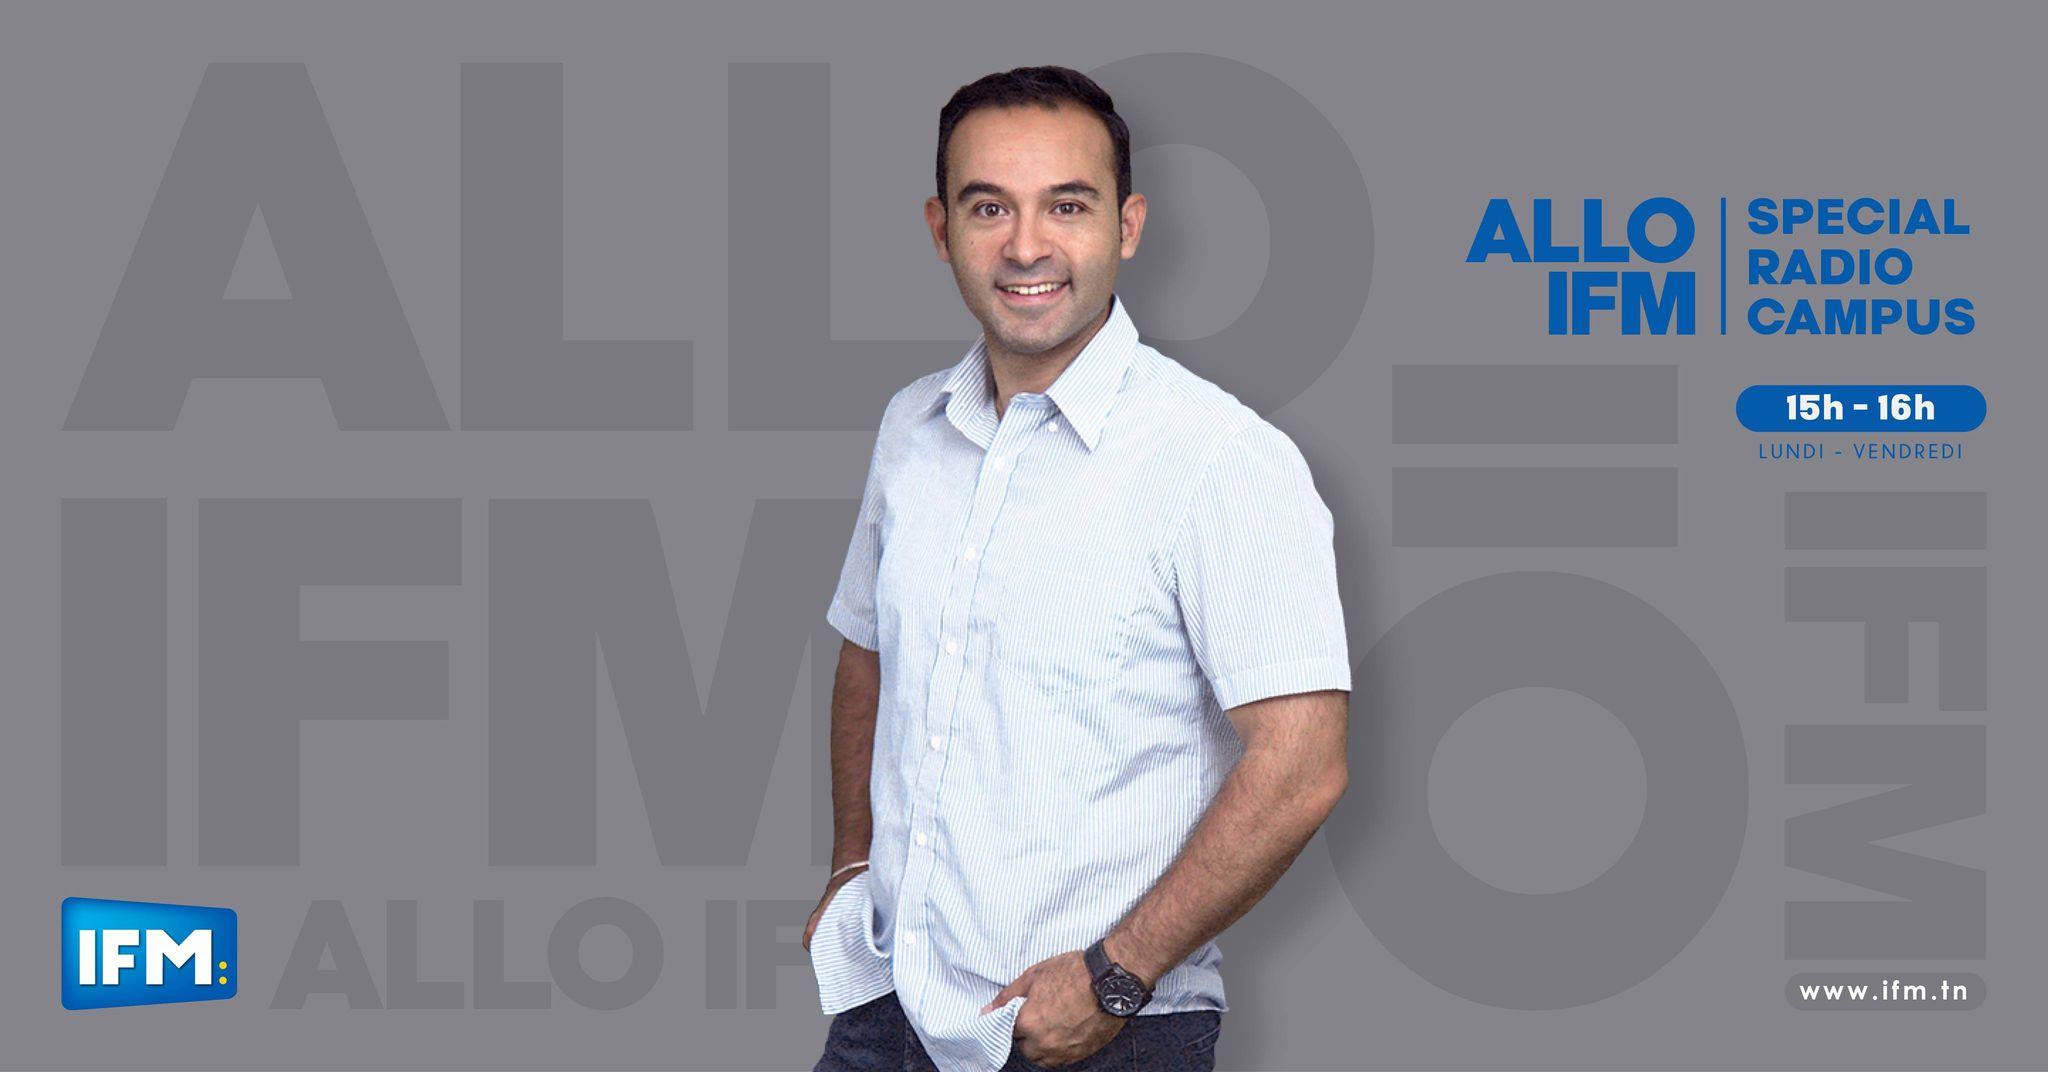 Allo IFM allo ifm du 22 janvier 2021